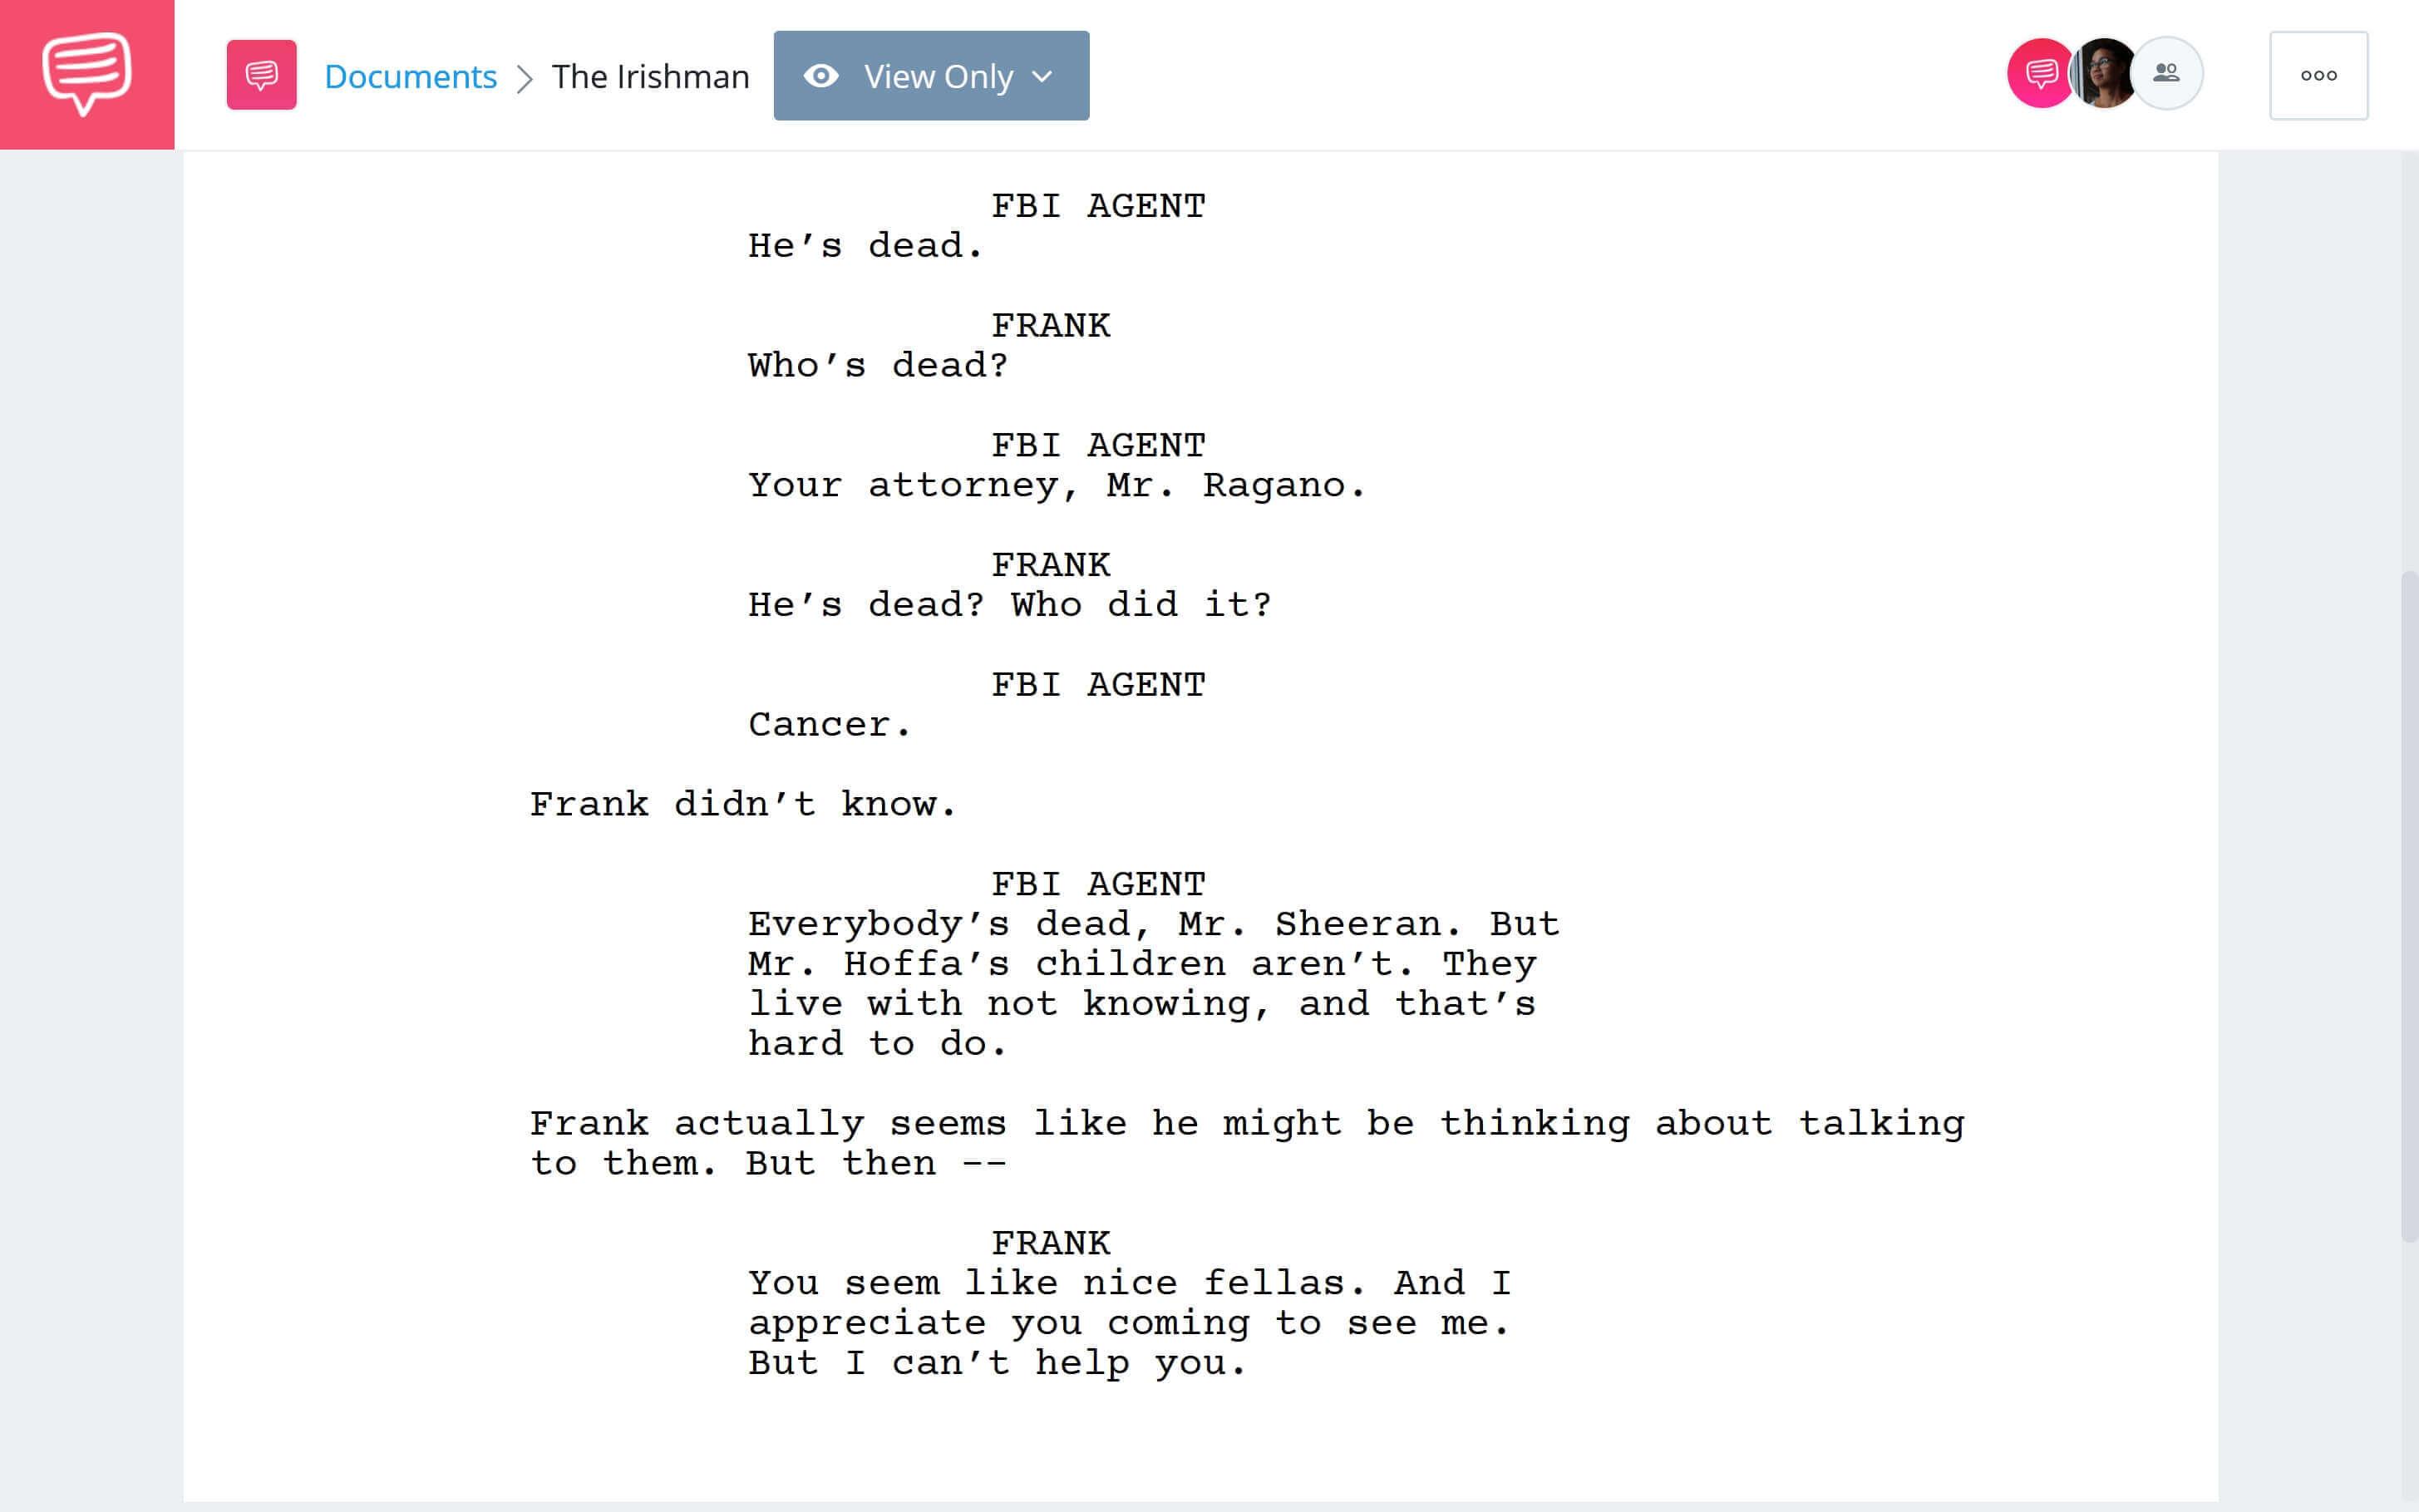 Is Irishman Based on a True Story - All Alone Scene Download App Tie-In - StudioBinder